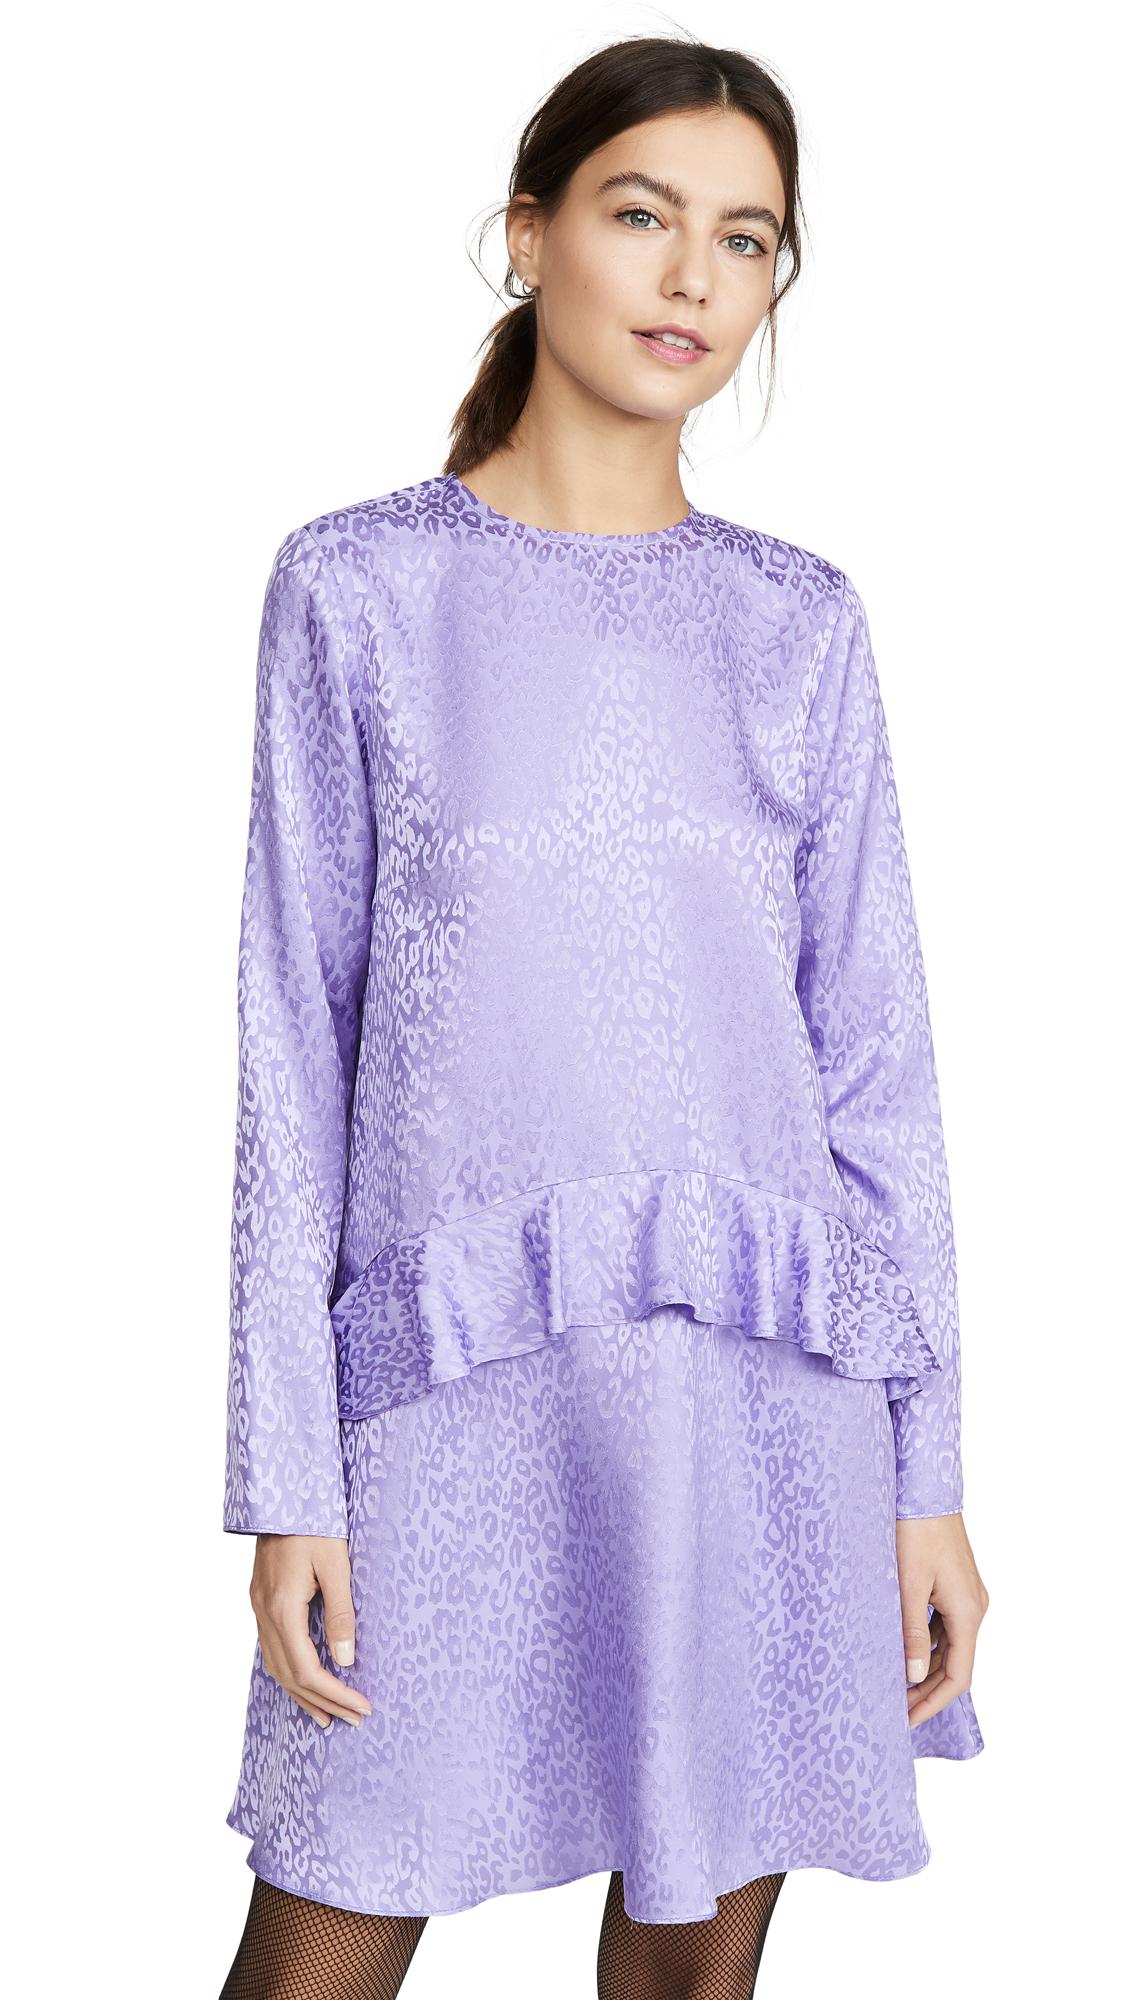 LES REVERIES Ruffle Skirt Mini Dress - 70% Off Sale